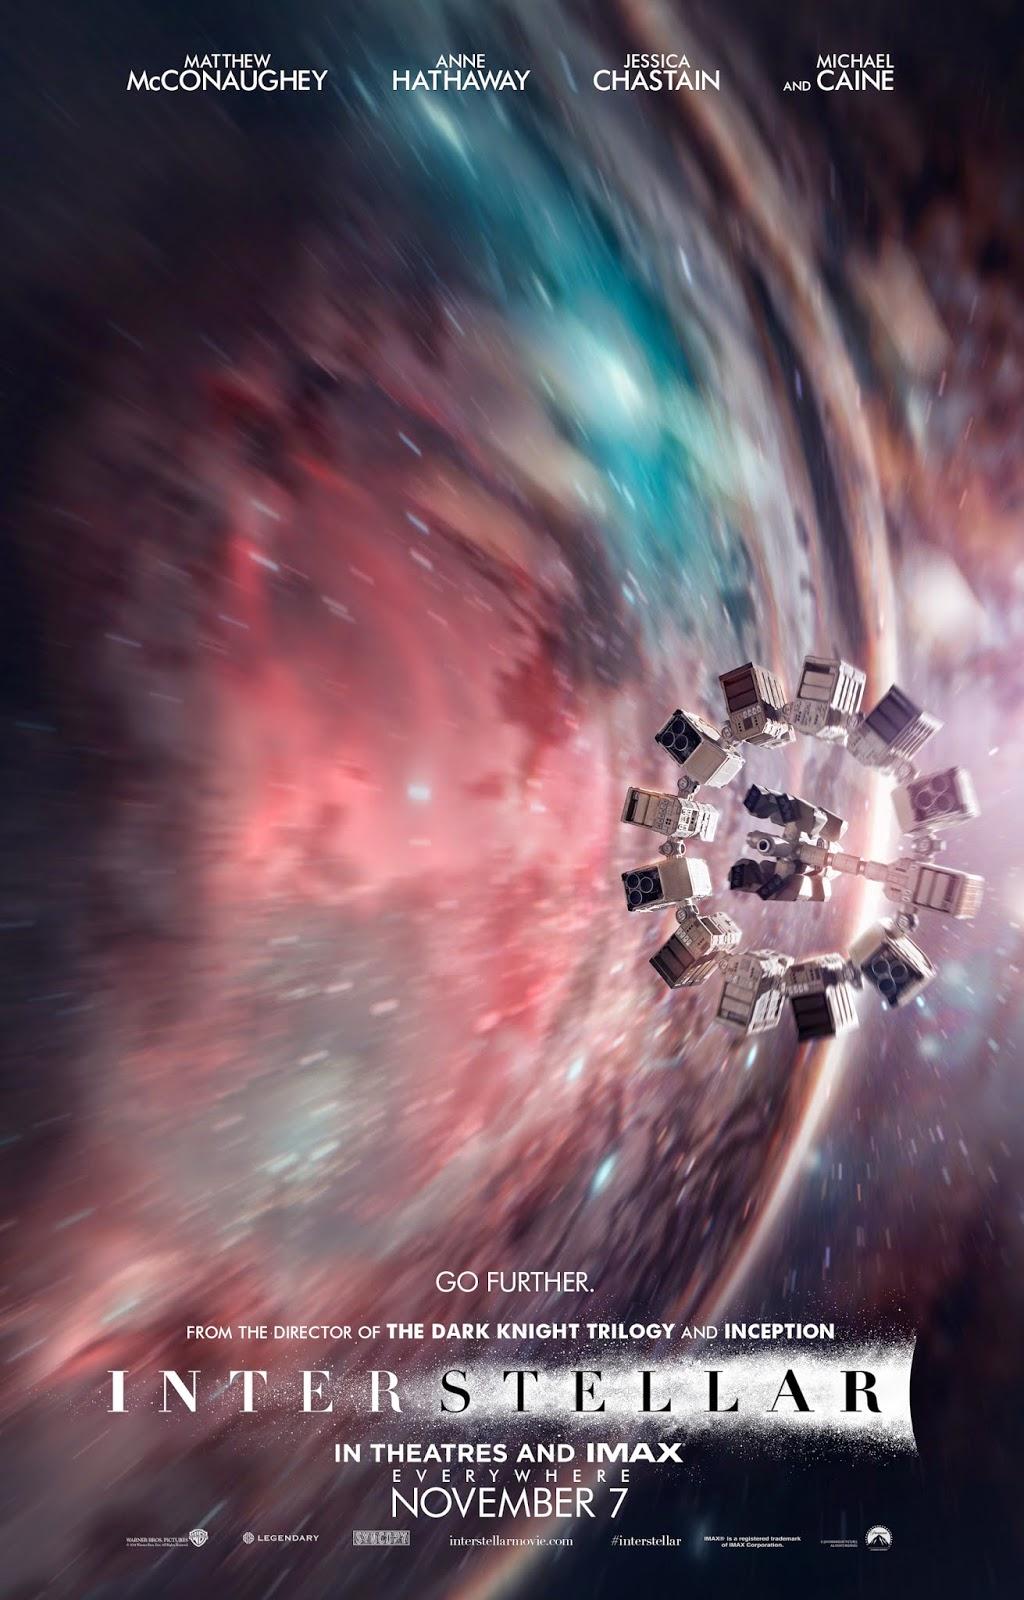 interstellar recenzja filmu christopher nolan matthew mcconaughey